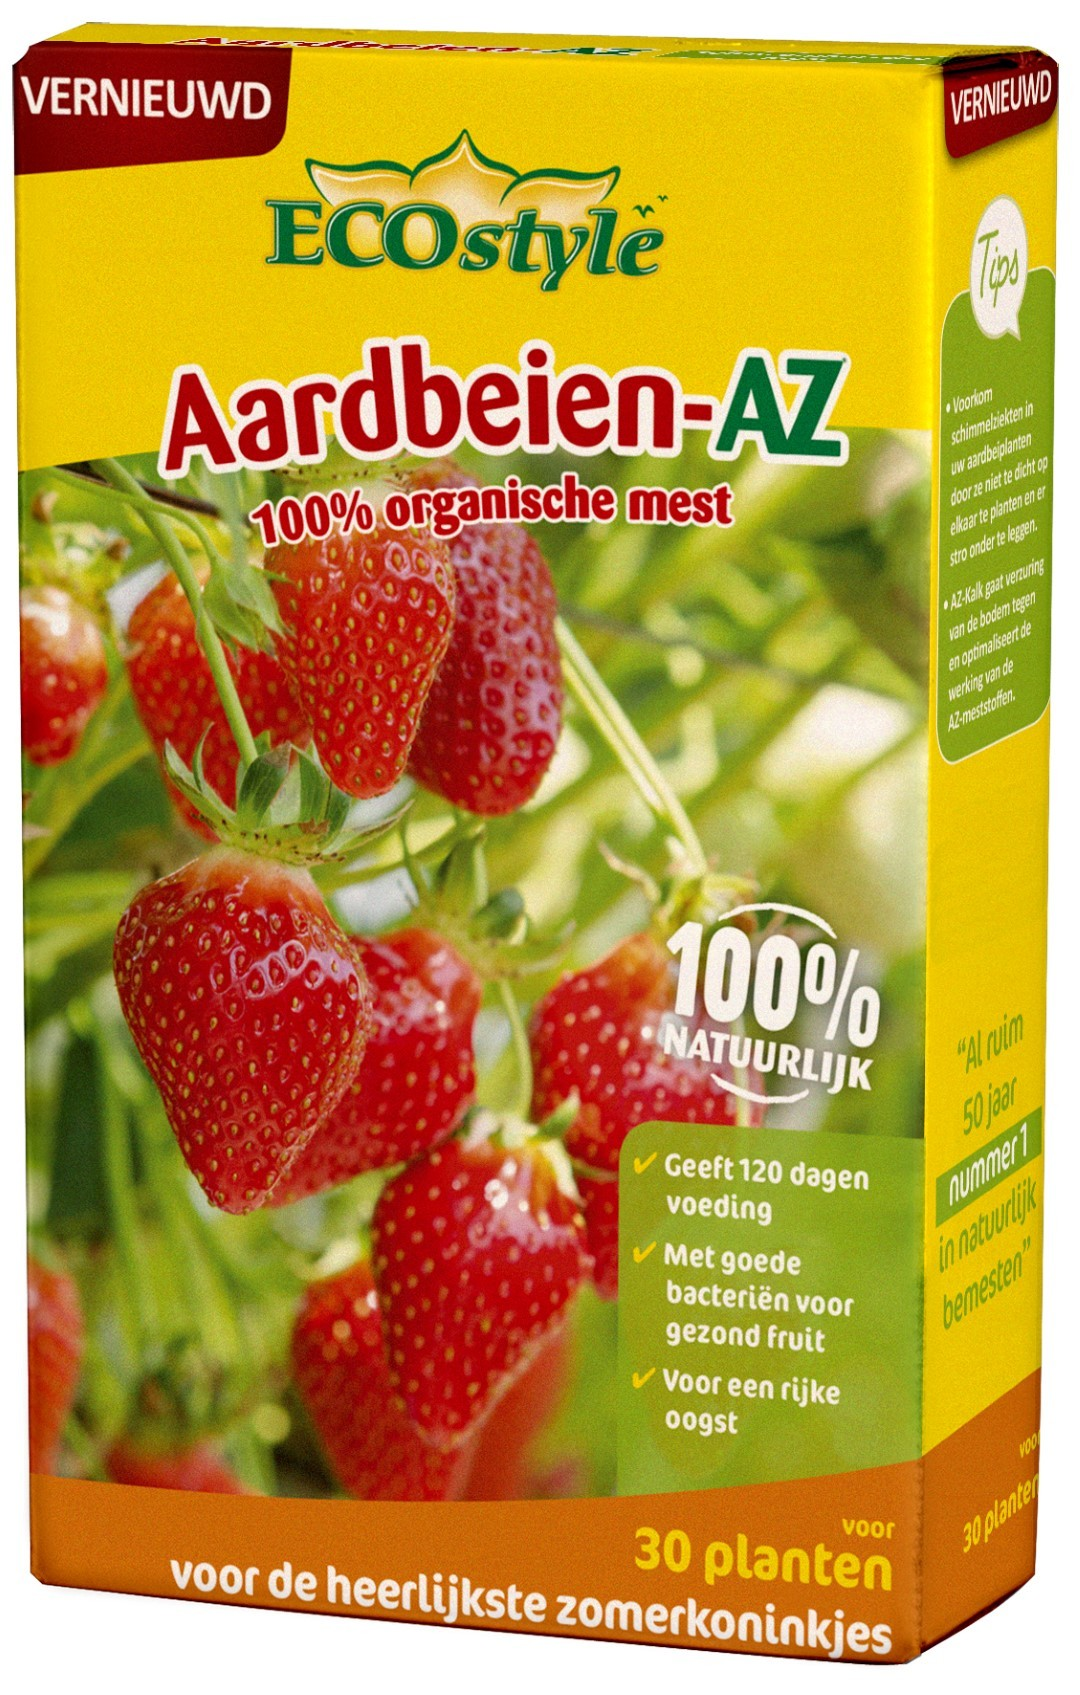 Aardbeien-AZ 800 g